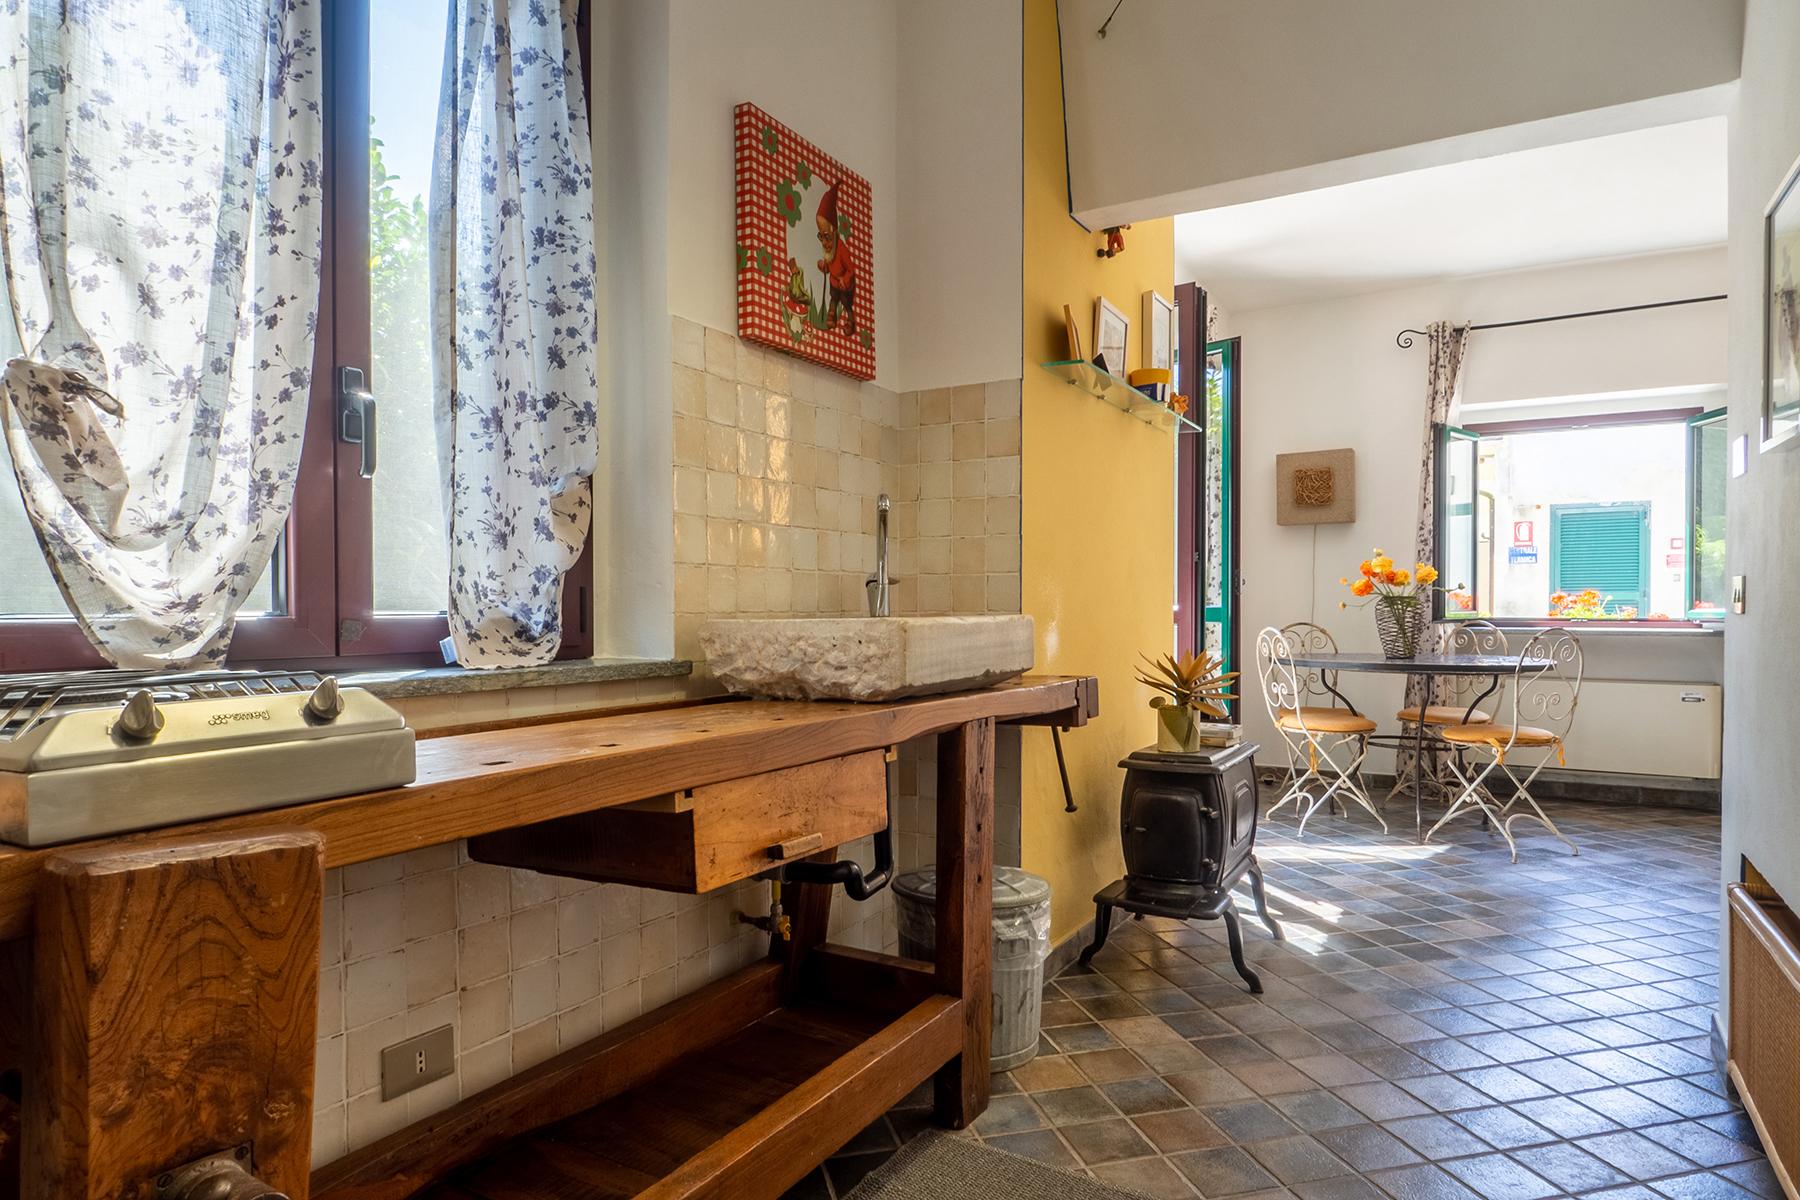 Rustico in Vendita a Valenza: 5 locali, 1800 mq - Foto 11